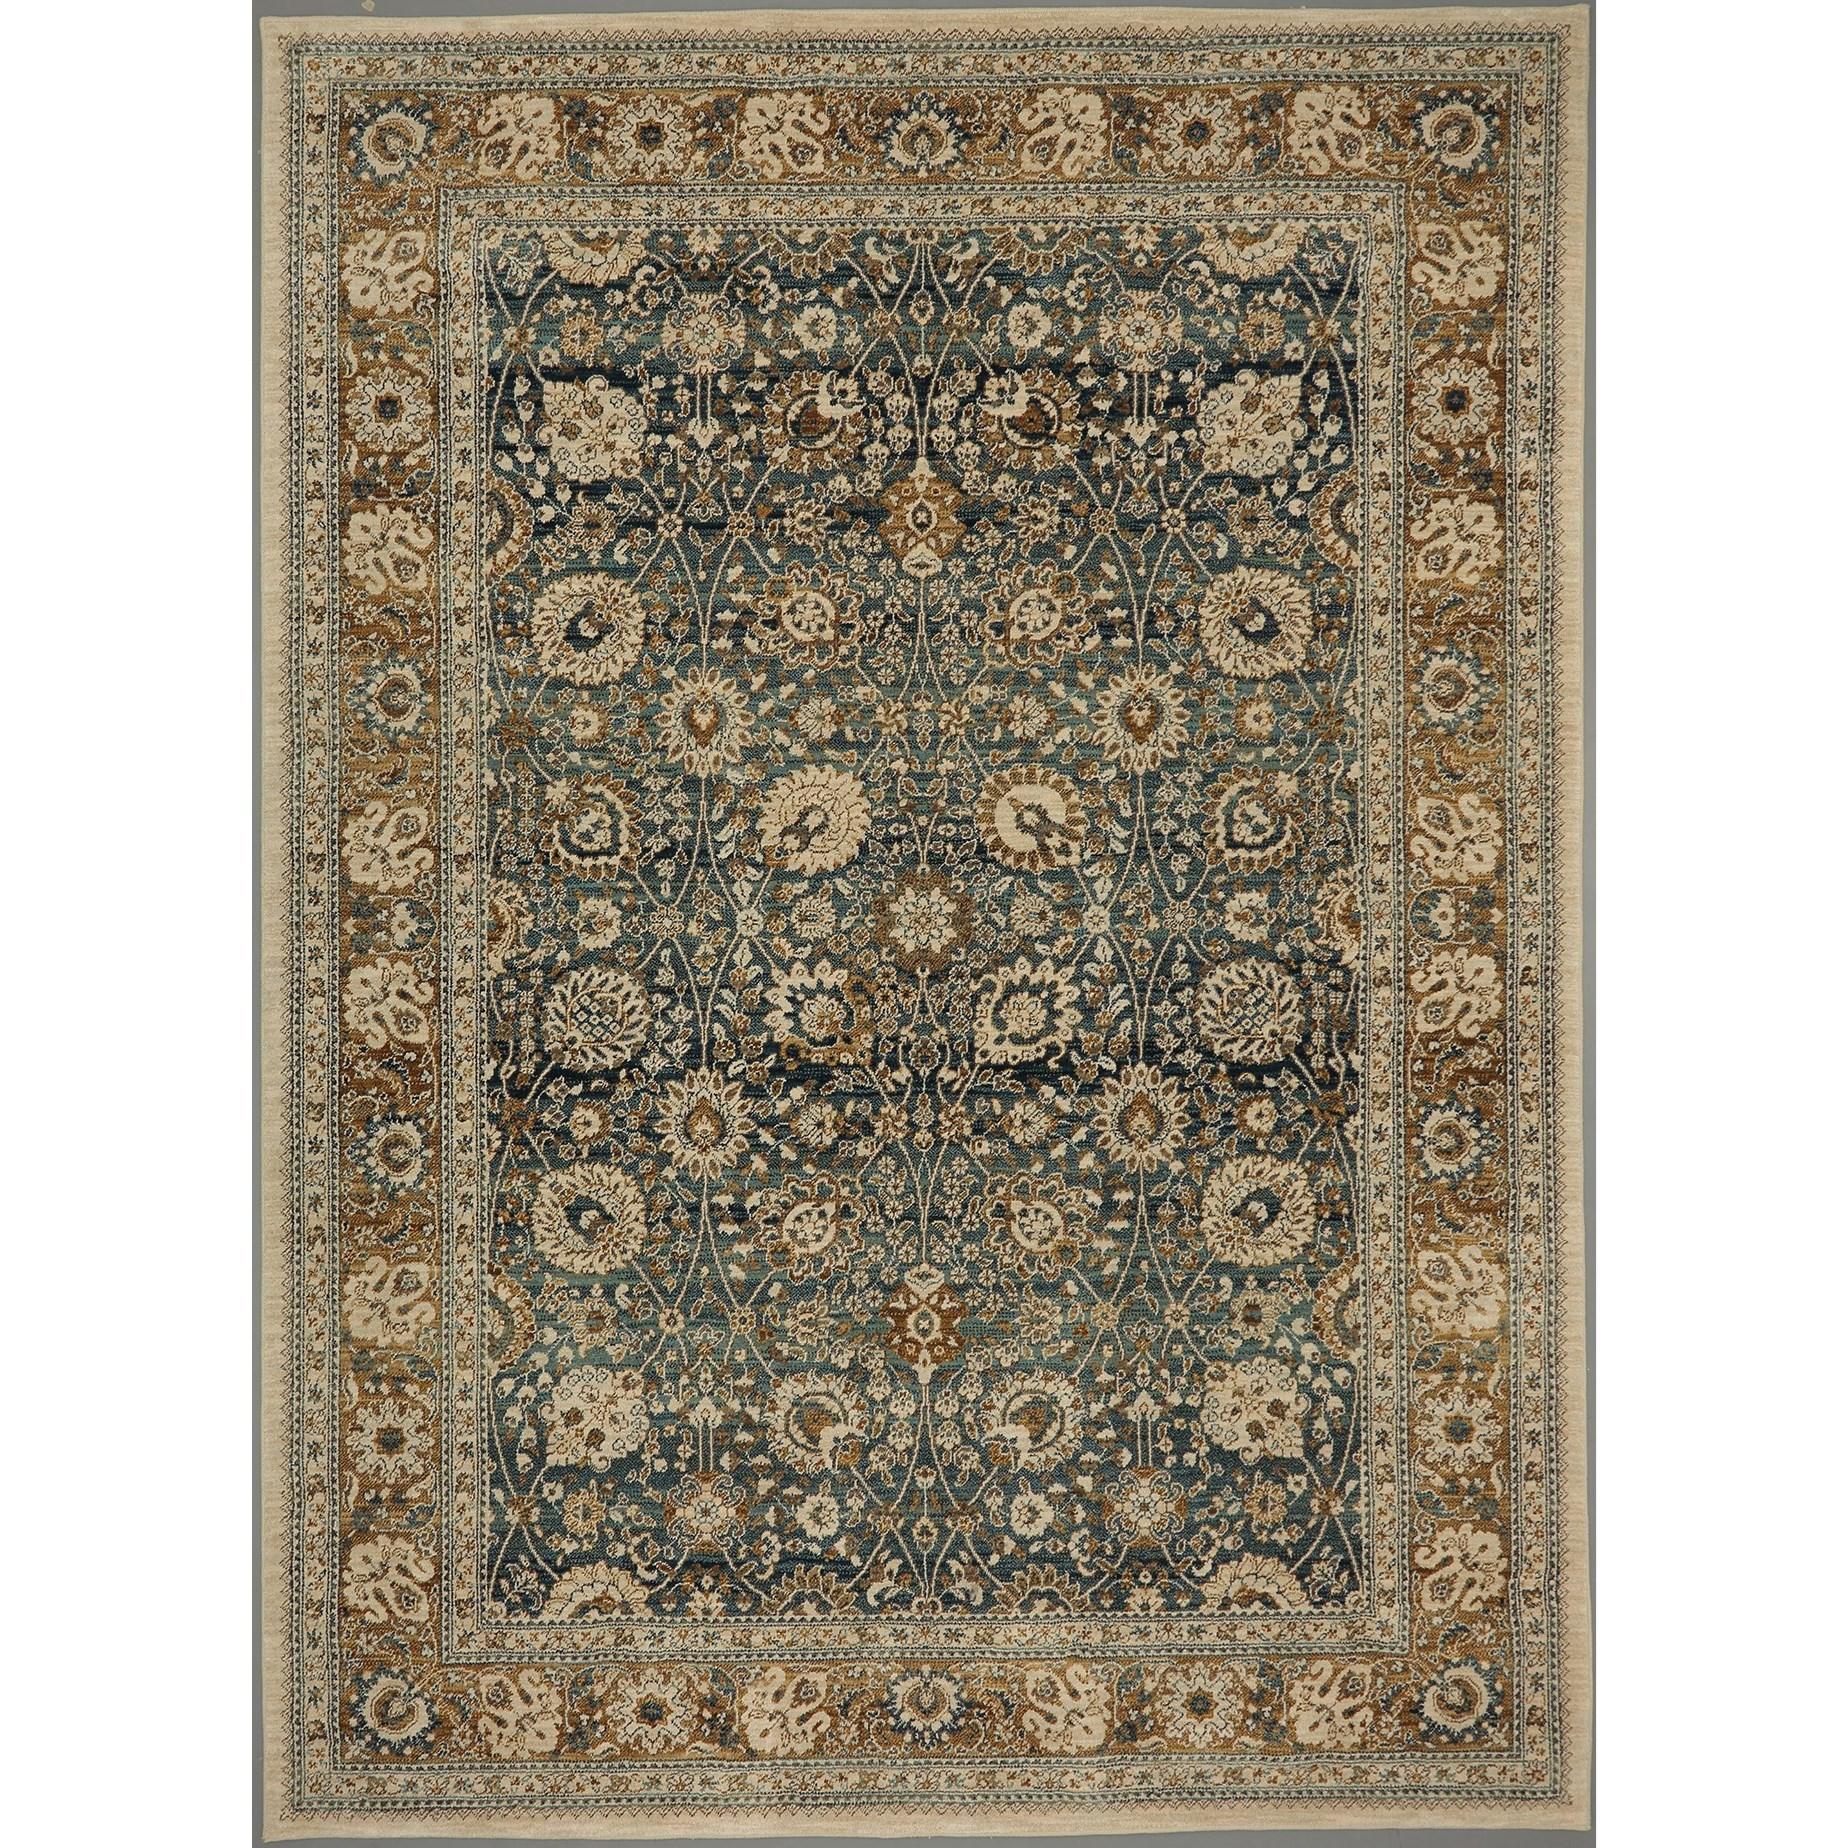 Karastan Rugs Spice Market 2x3 Rectangle Ornamental Area Rug Item